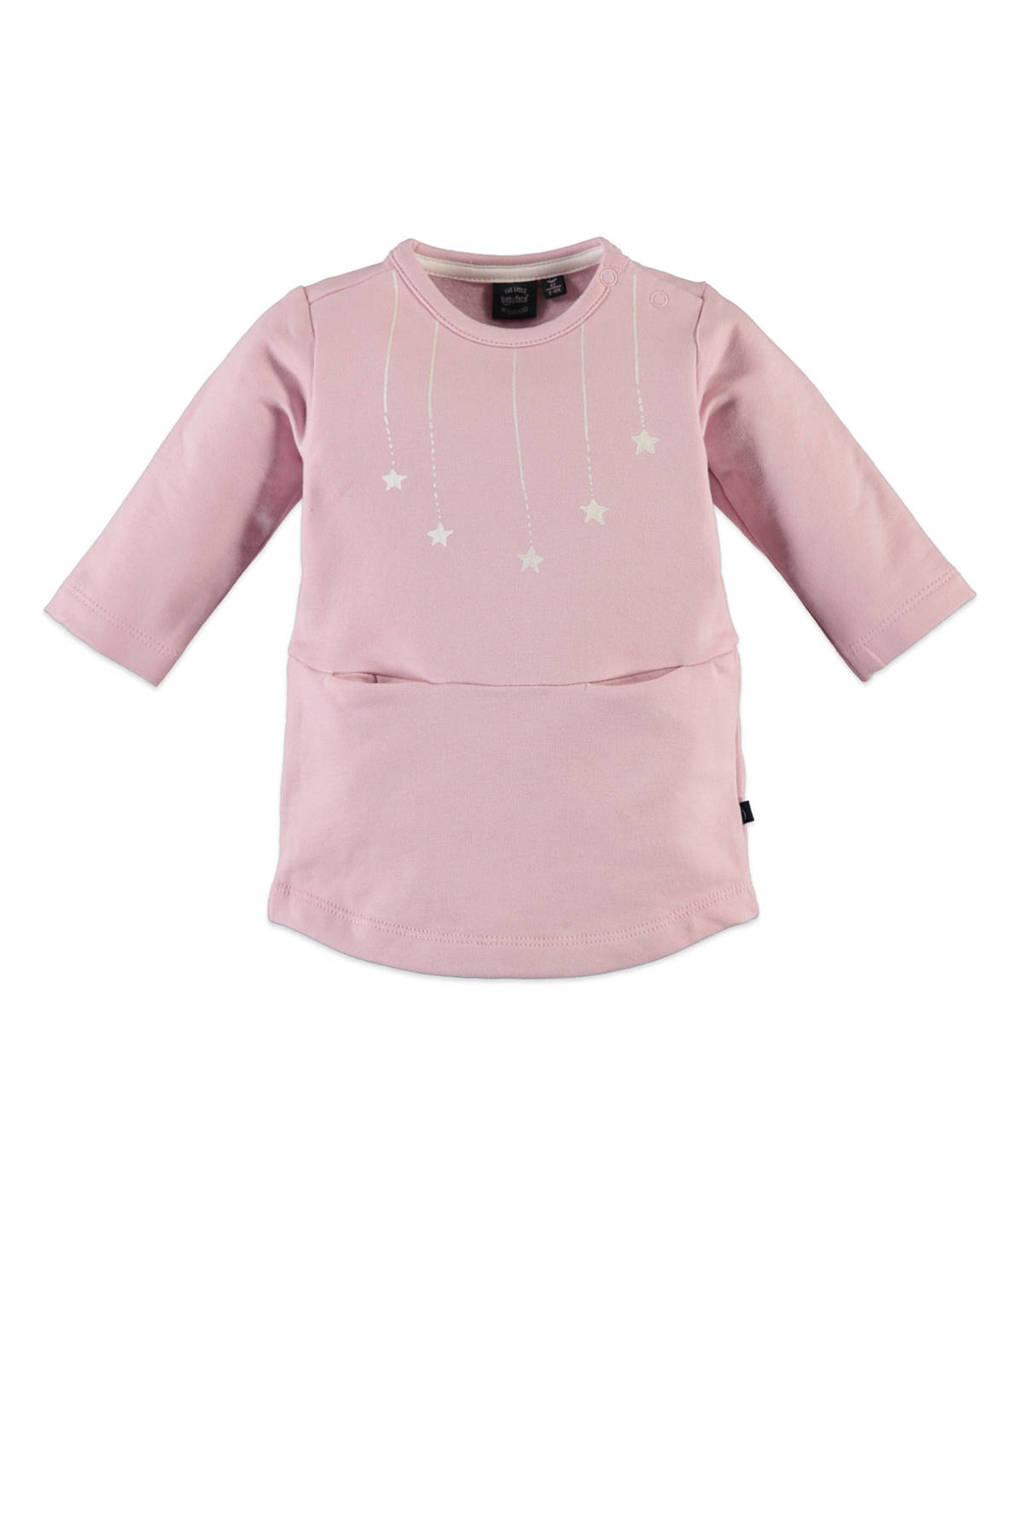 Babyface jersey jurk met printopdruk roze, Roze